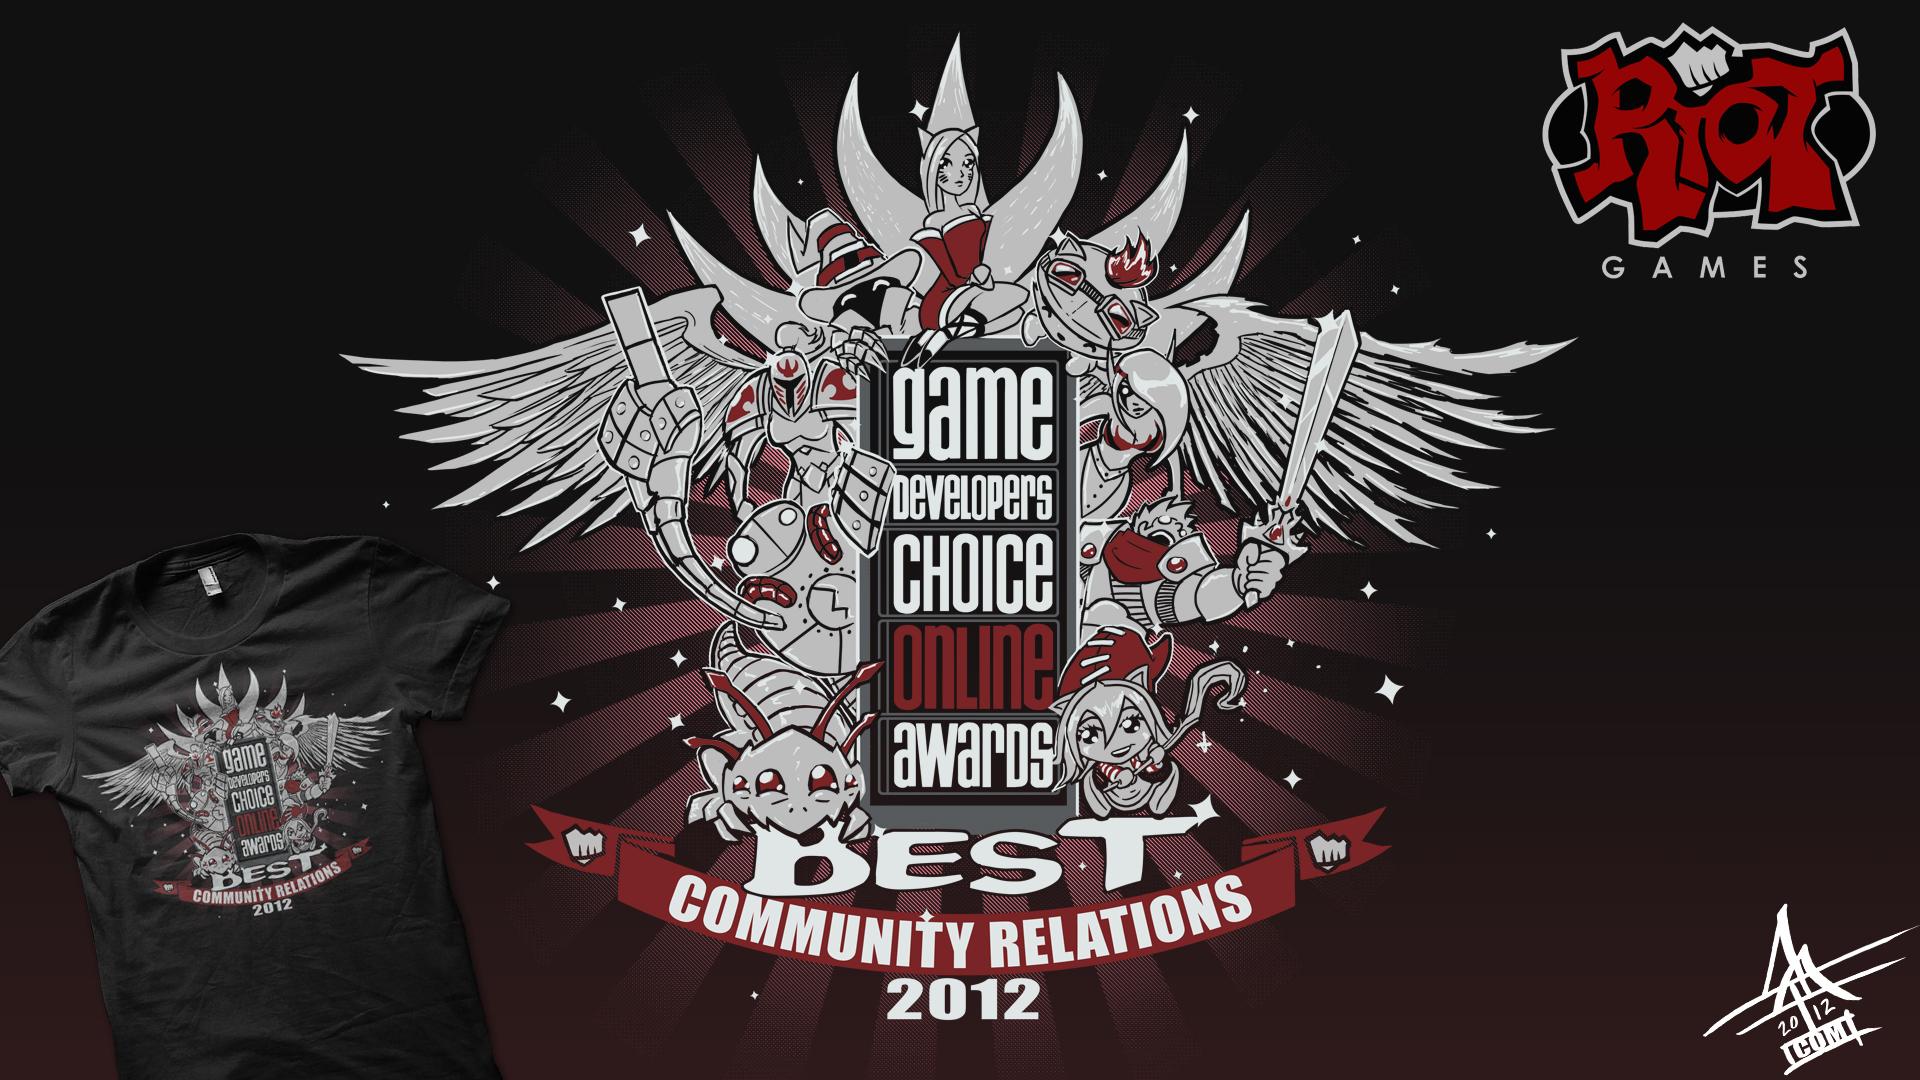 Riot games gdc staff shirt by mattcomgo on deviantart